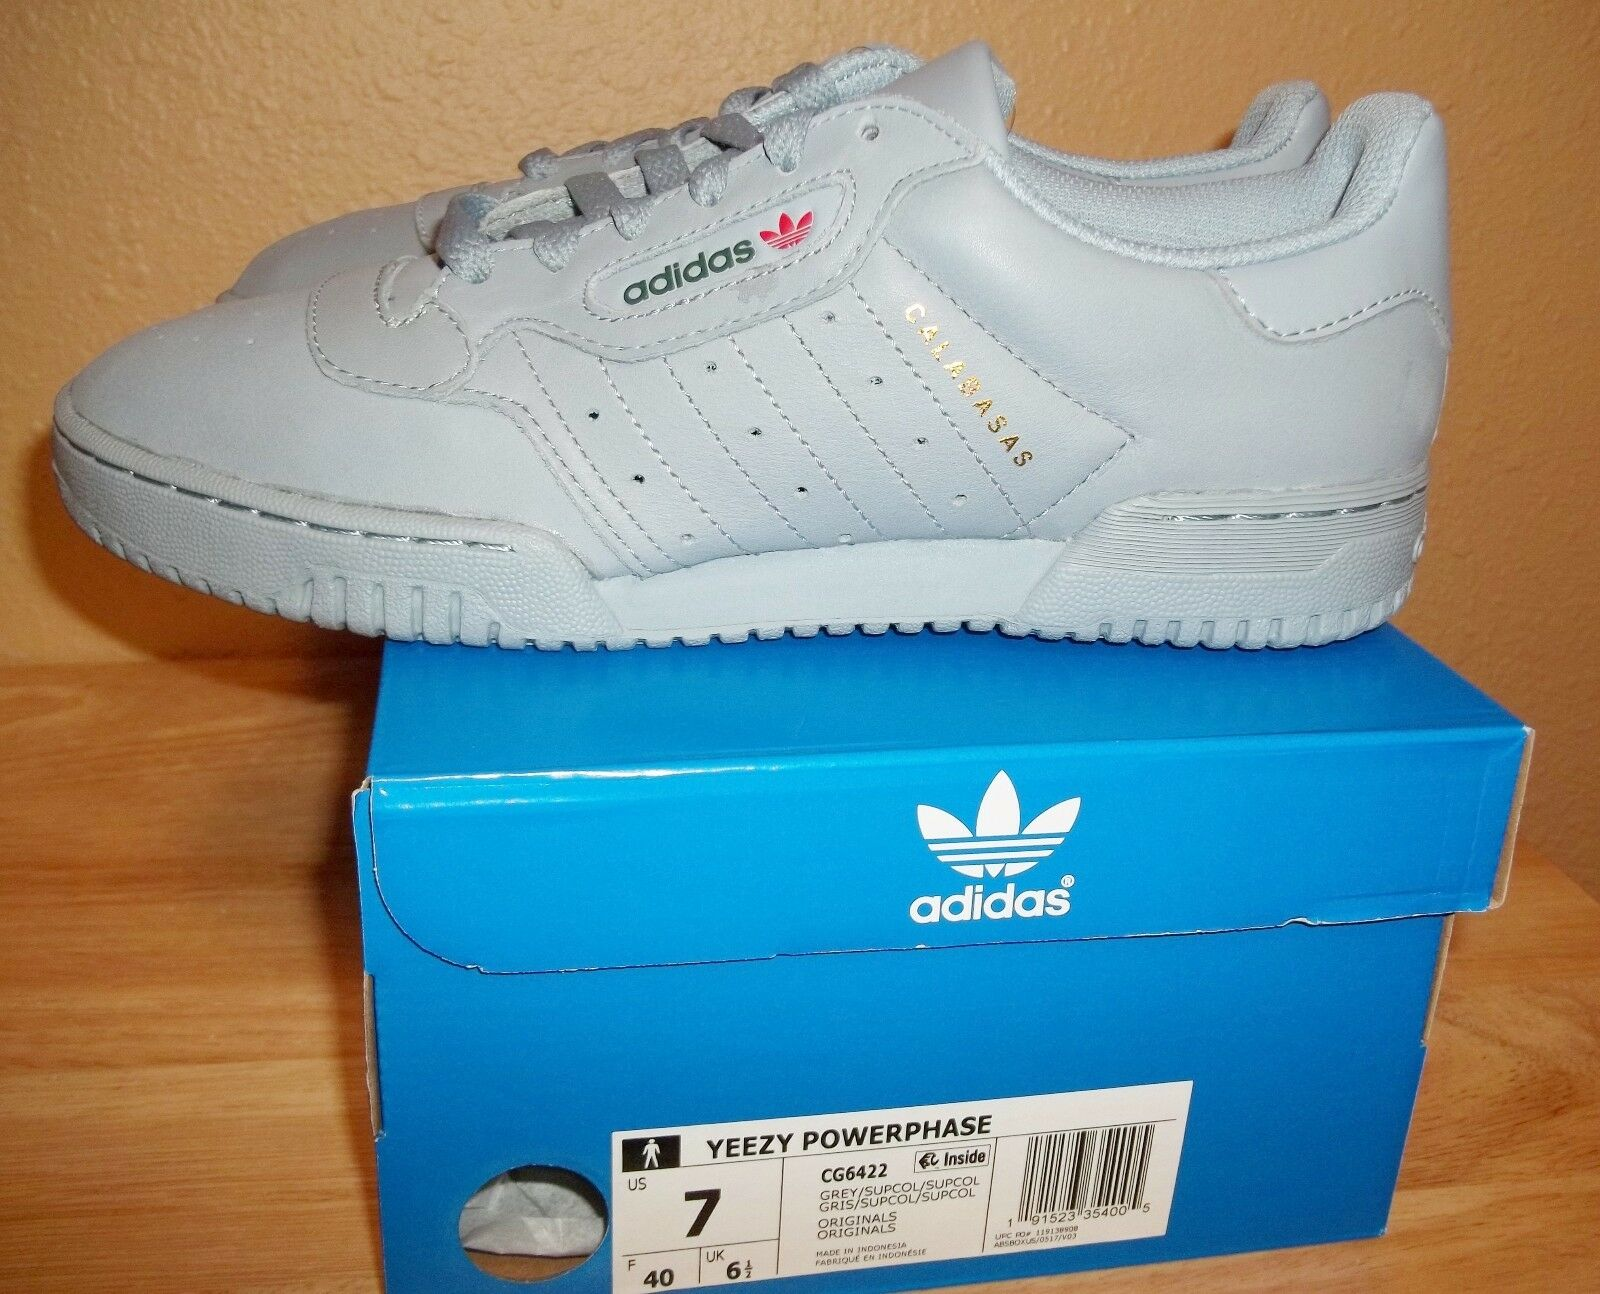 Adidas Yeezy Powerphase Grey Shoes Kanye West CG6422 New NIB size Men's US 7